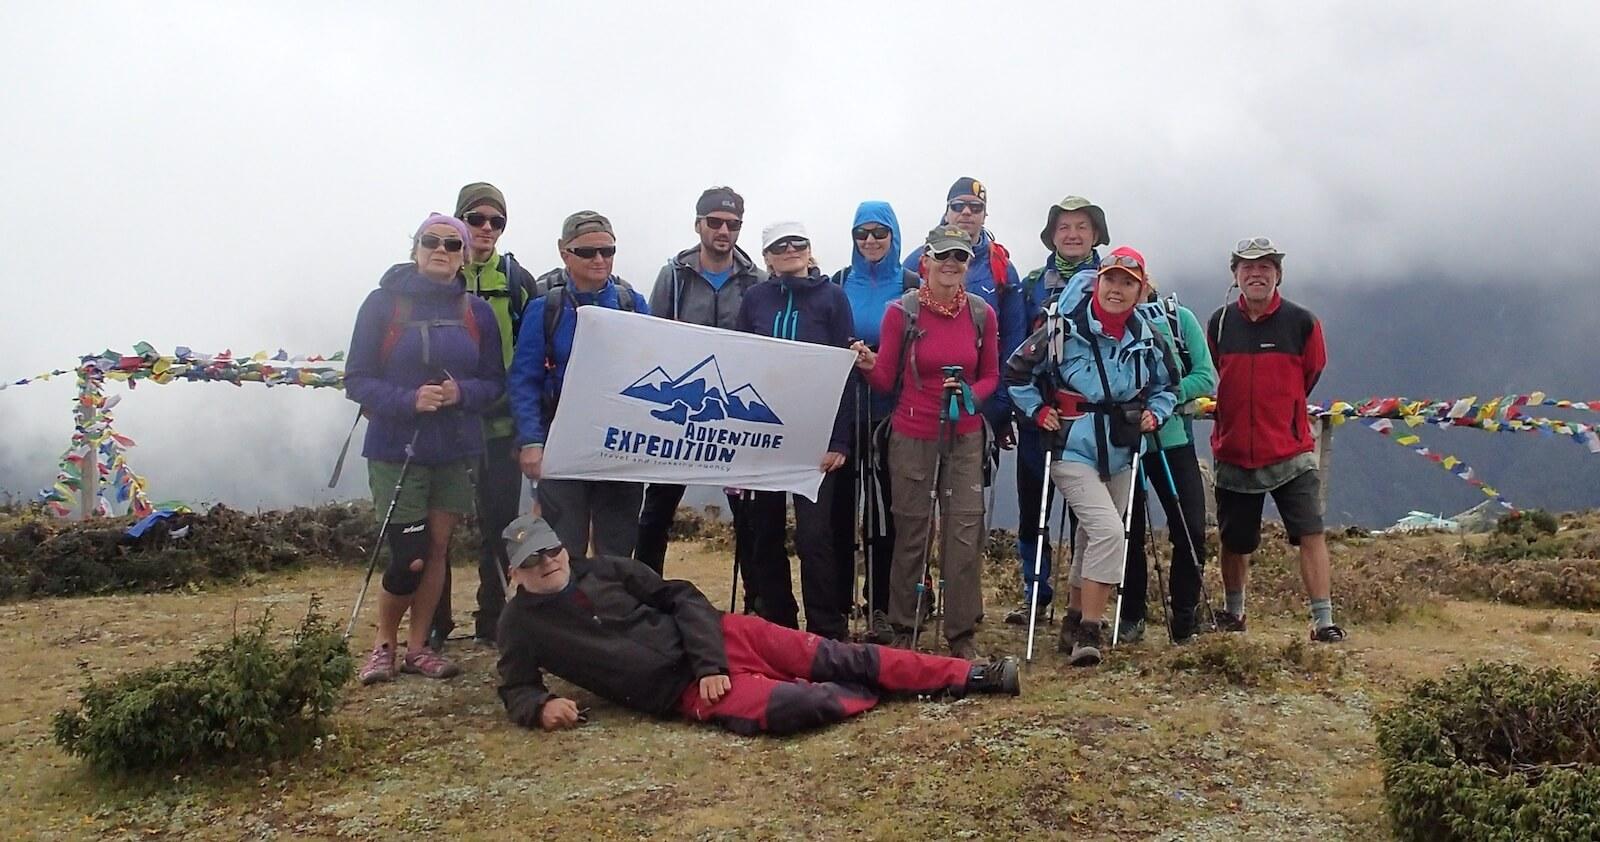 Nasza grupa na treku pod Everest